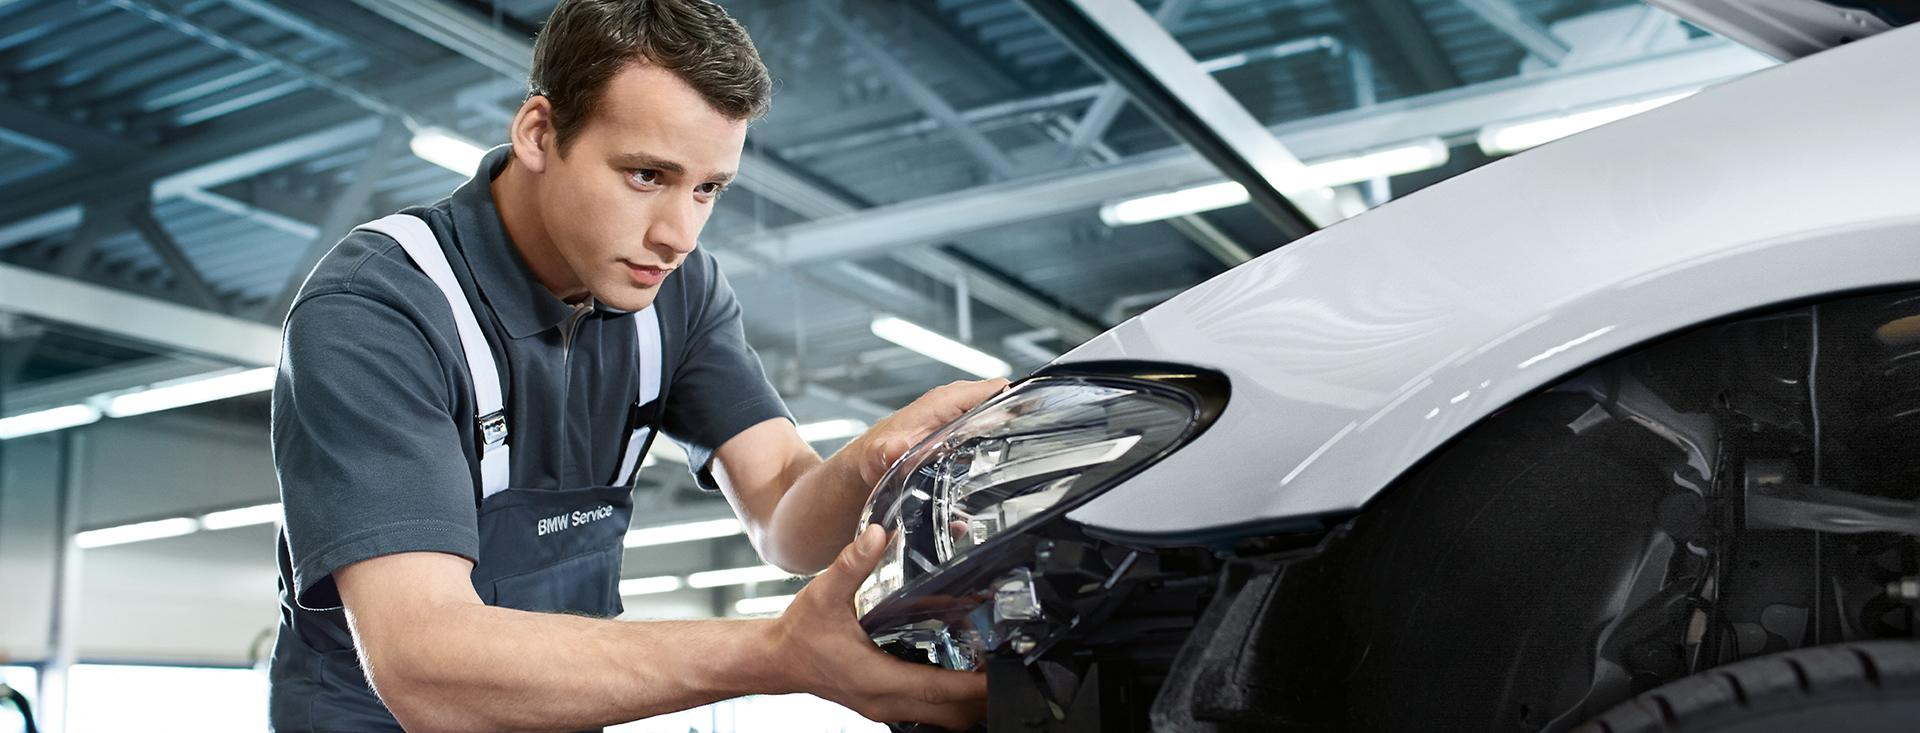 Service professional replacing a headlight